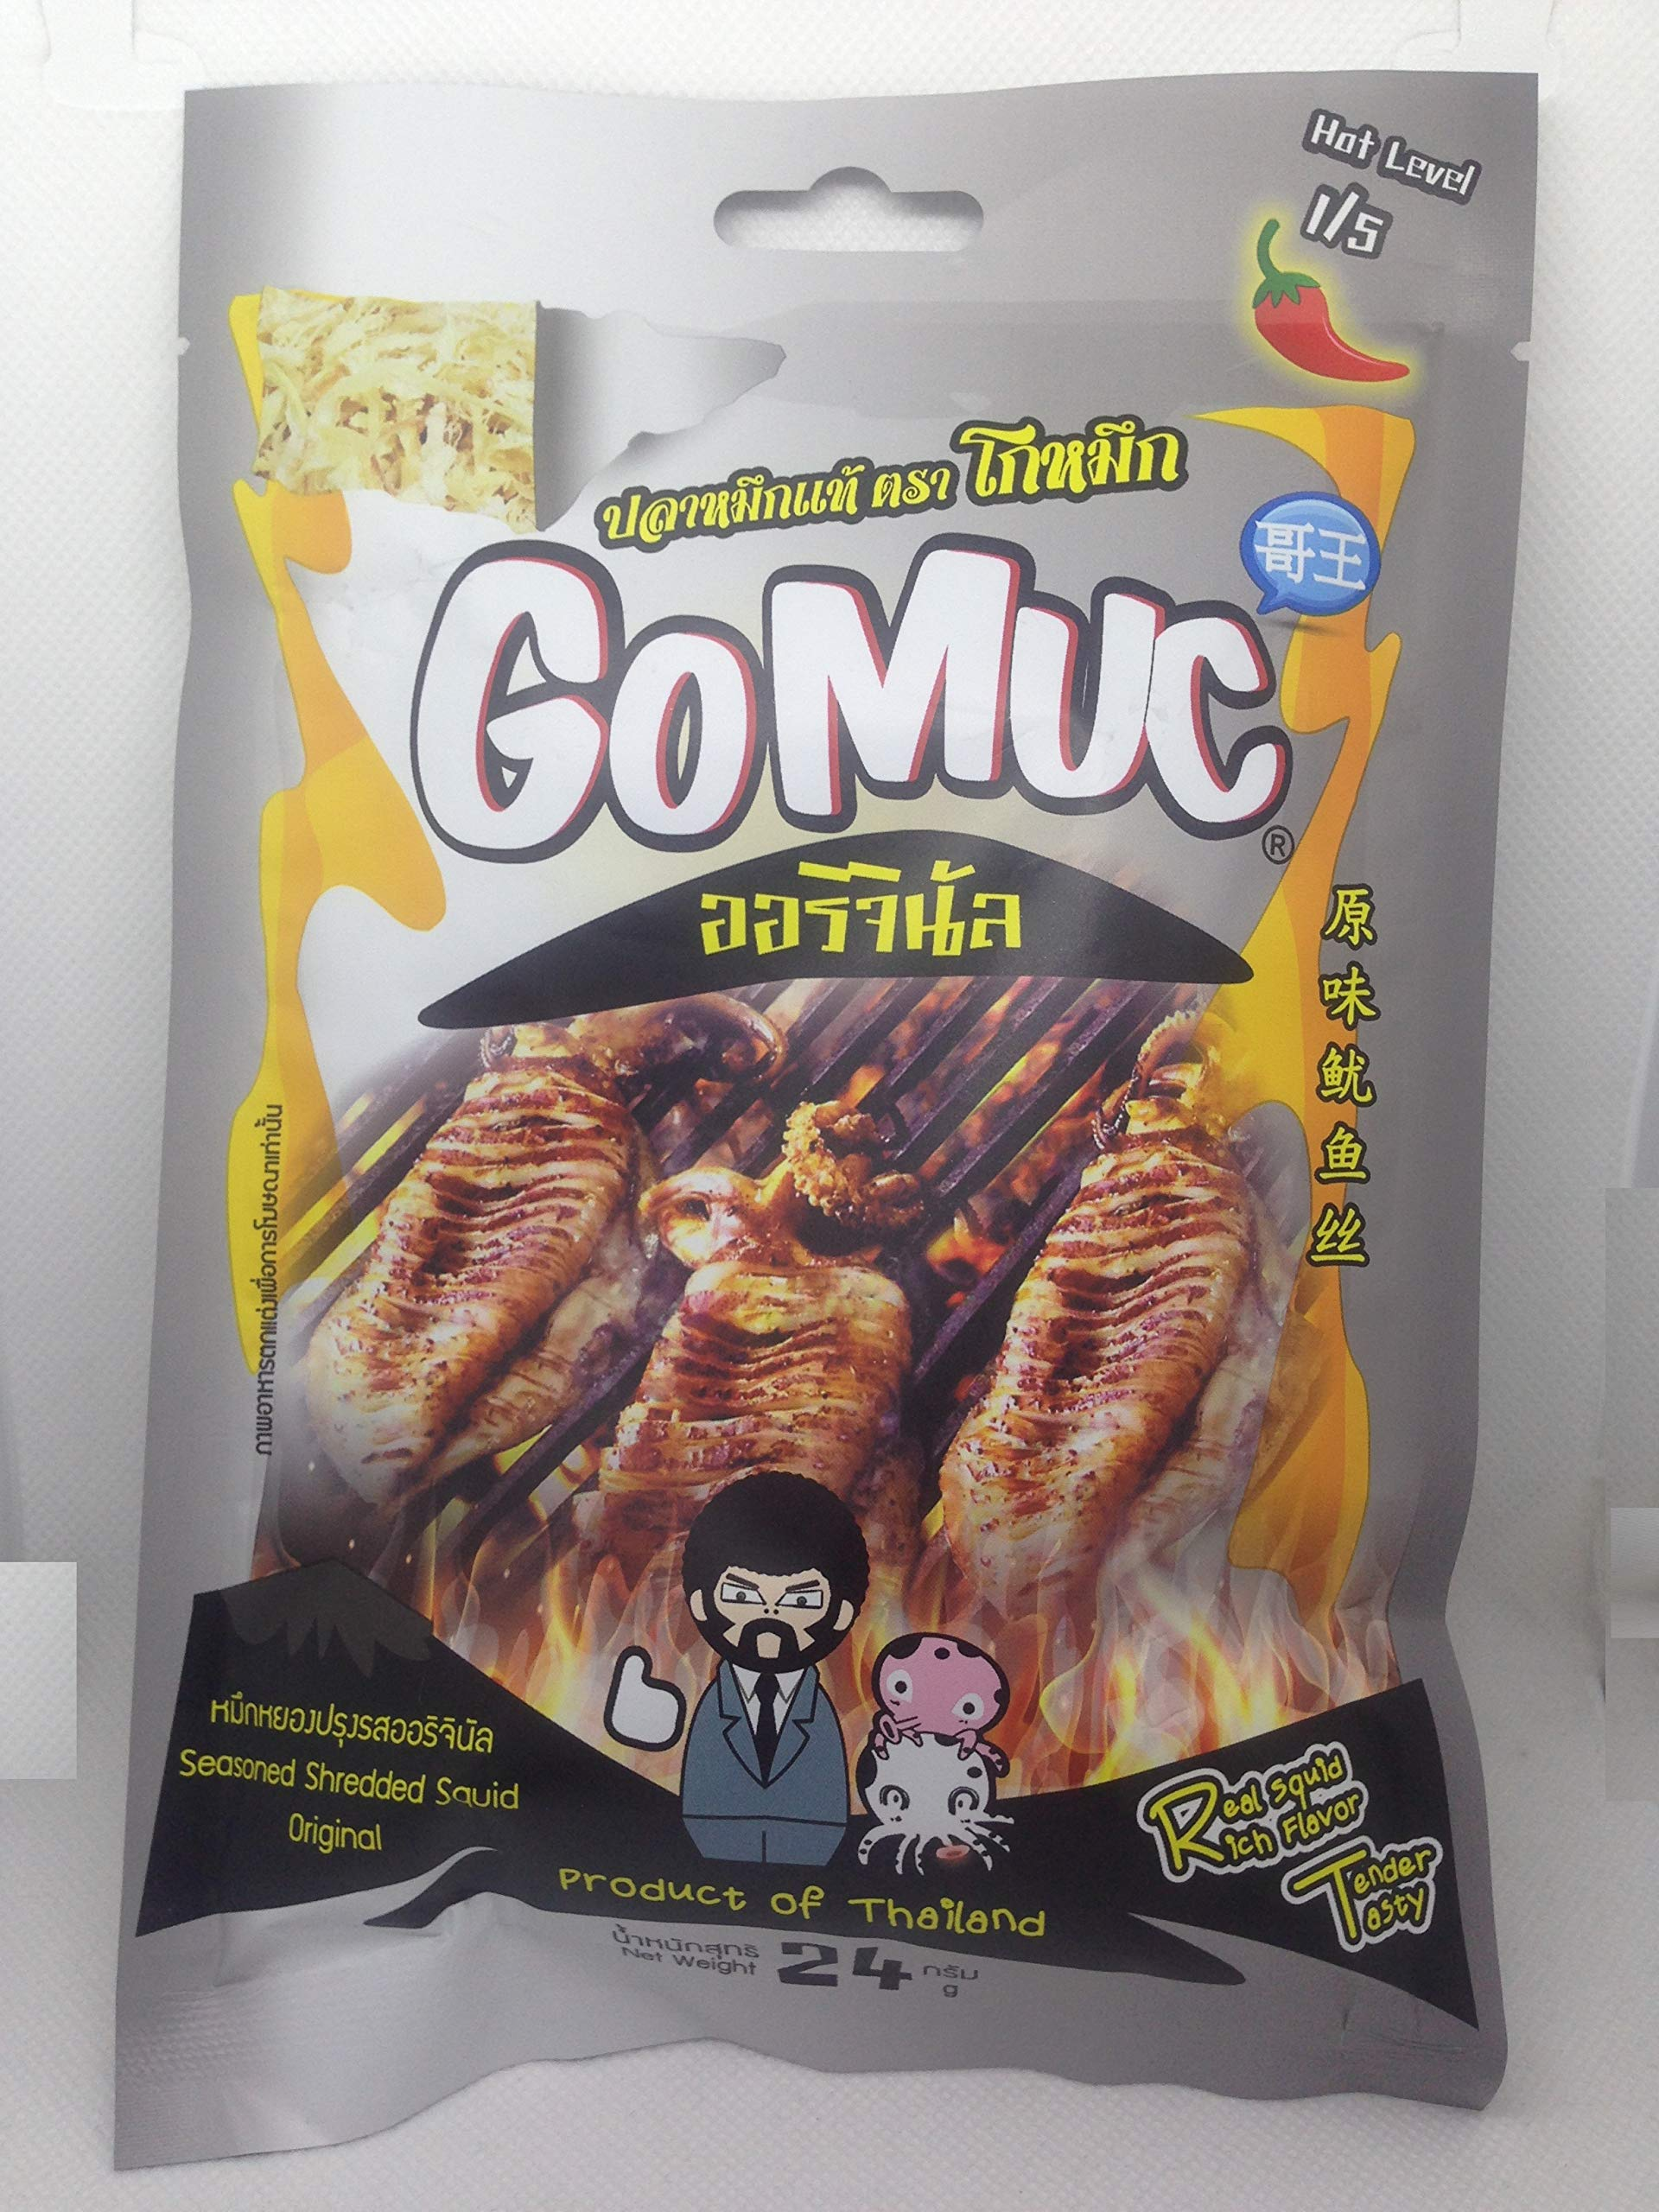 GOMUC Brand, Seasoned Shredded Squid, Original Flavour 24g X 4 Packs by Gomuc